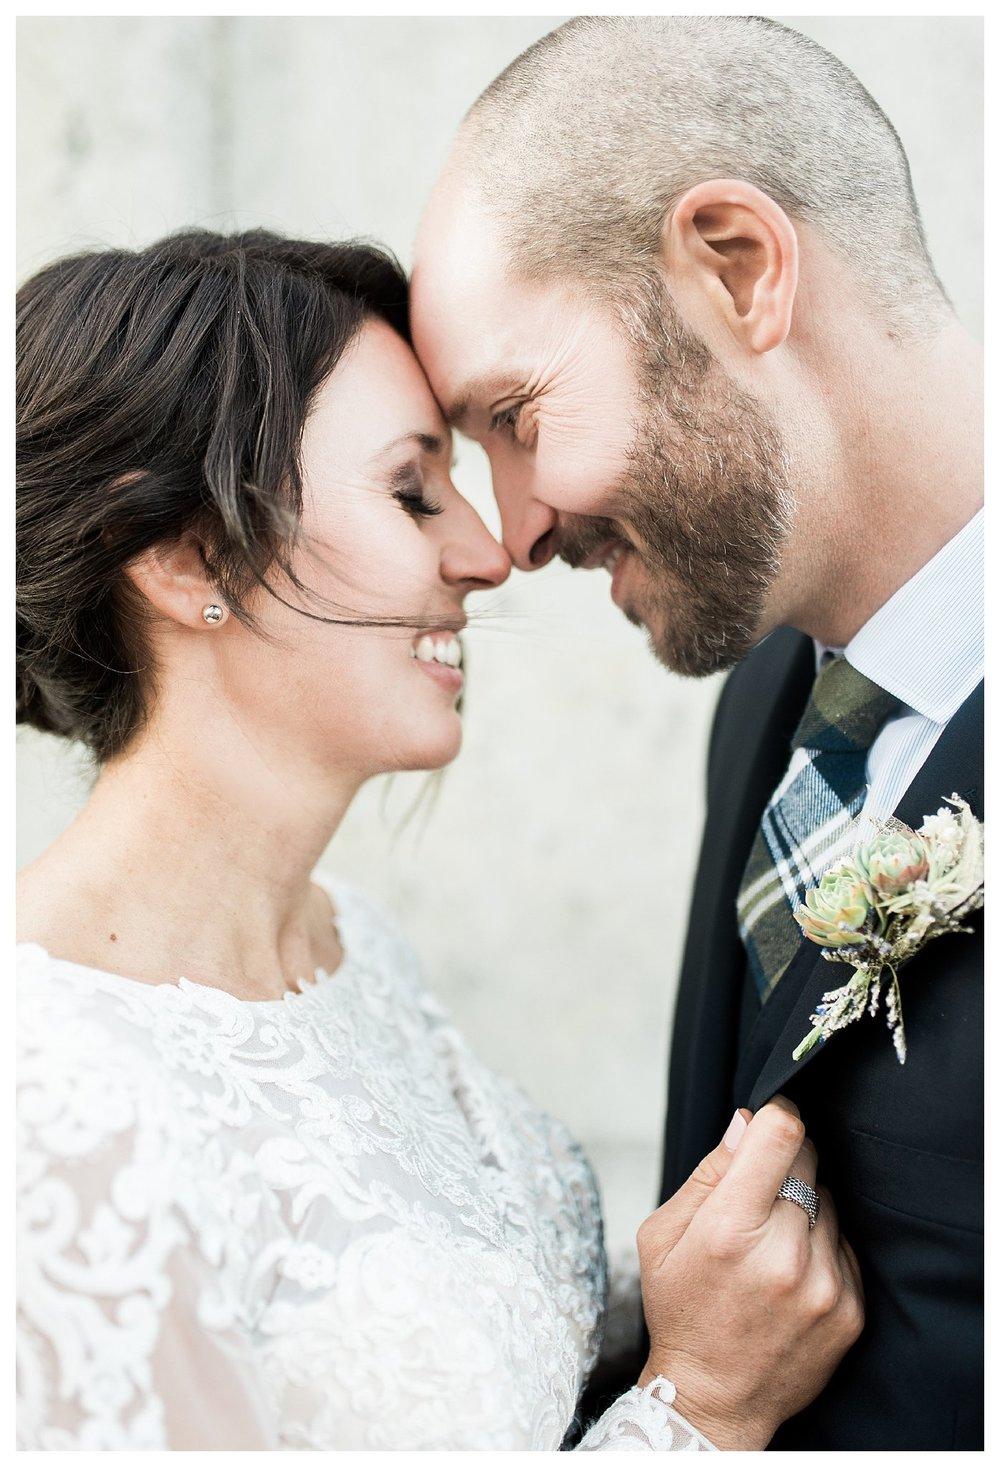 everleigh-photography-new-riff-distillery-cincinnati-wedding-photographer-northern-kentucky-wedding-photographer-jamie-and-dan-30